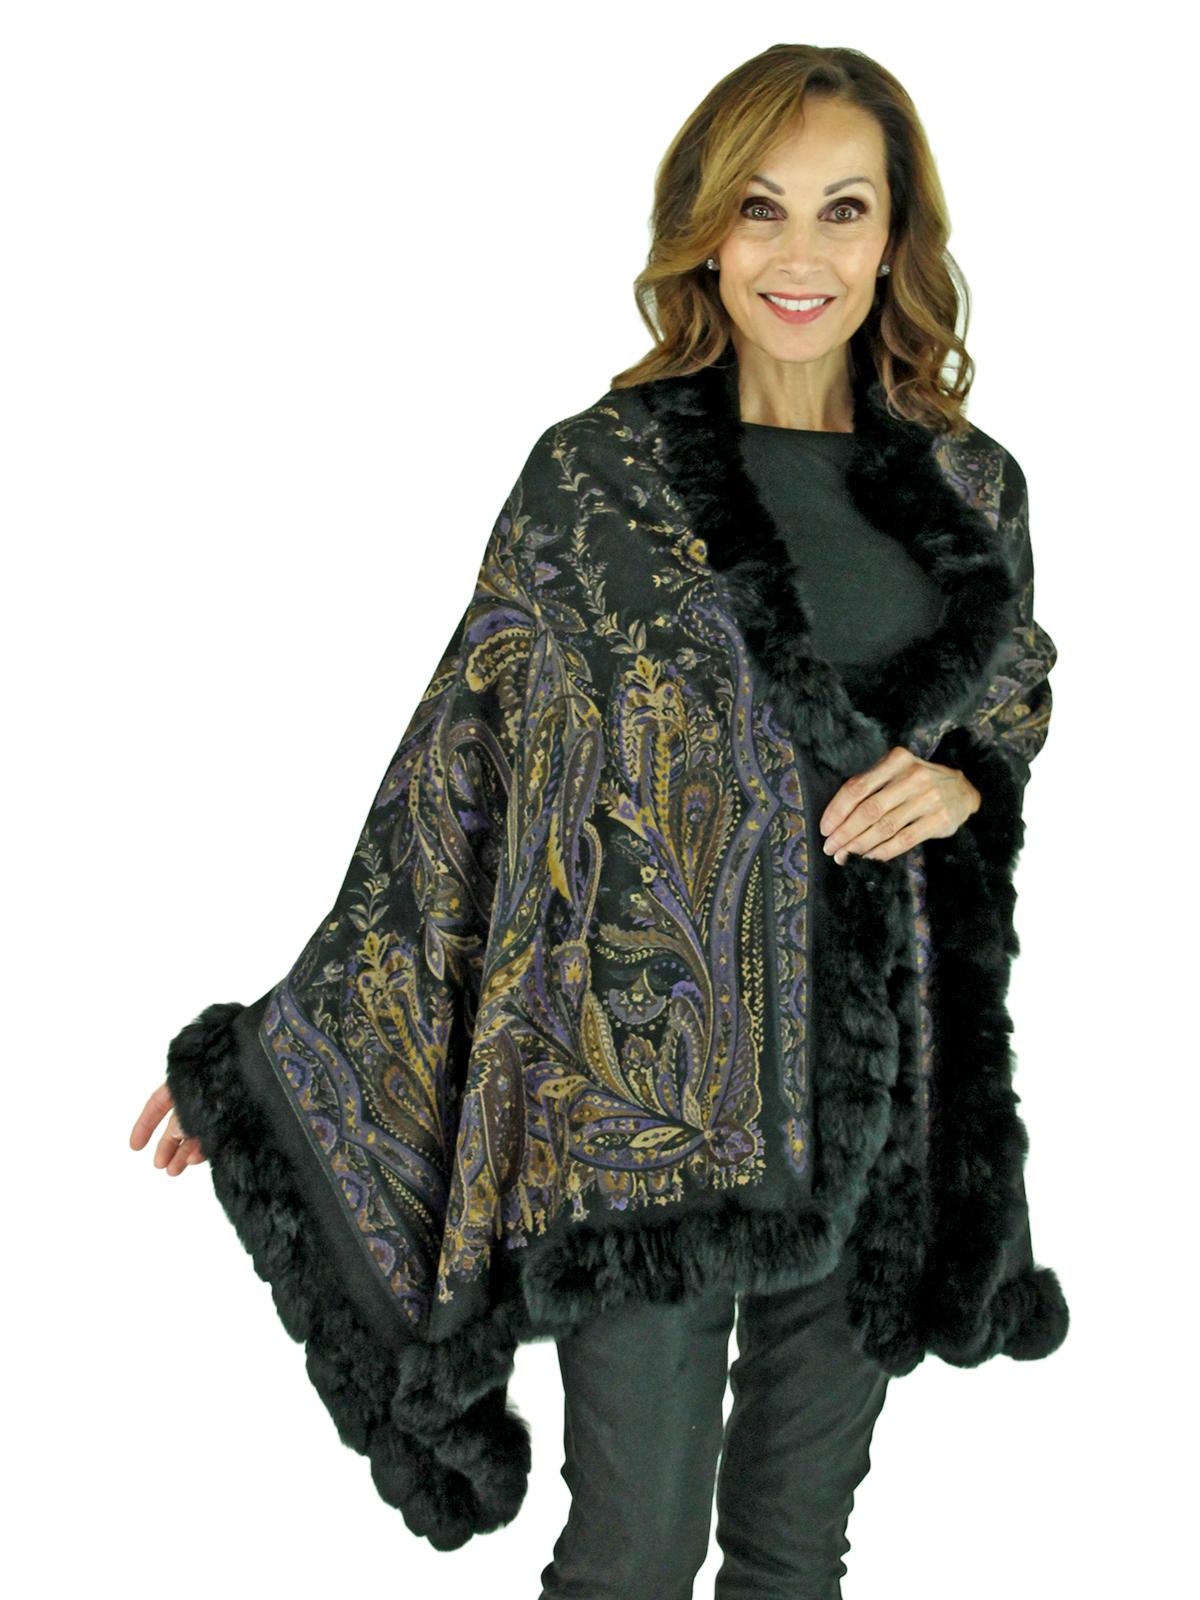 Gorski Woman's Black Paisley Cashmere Wool Stole with Rex Rabbit Trim